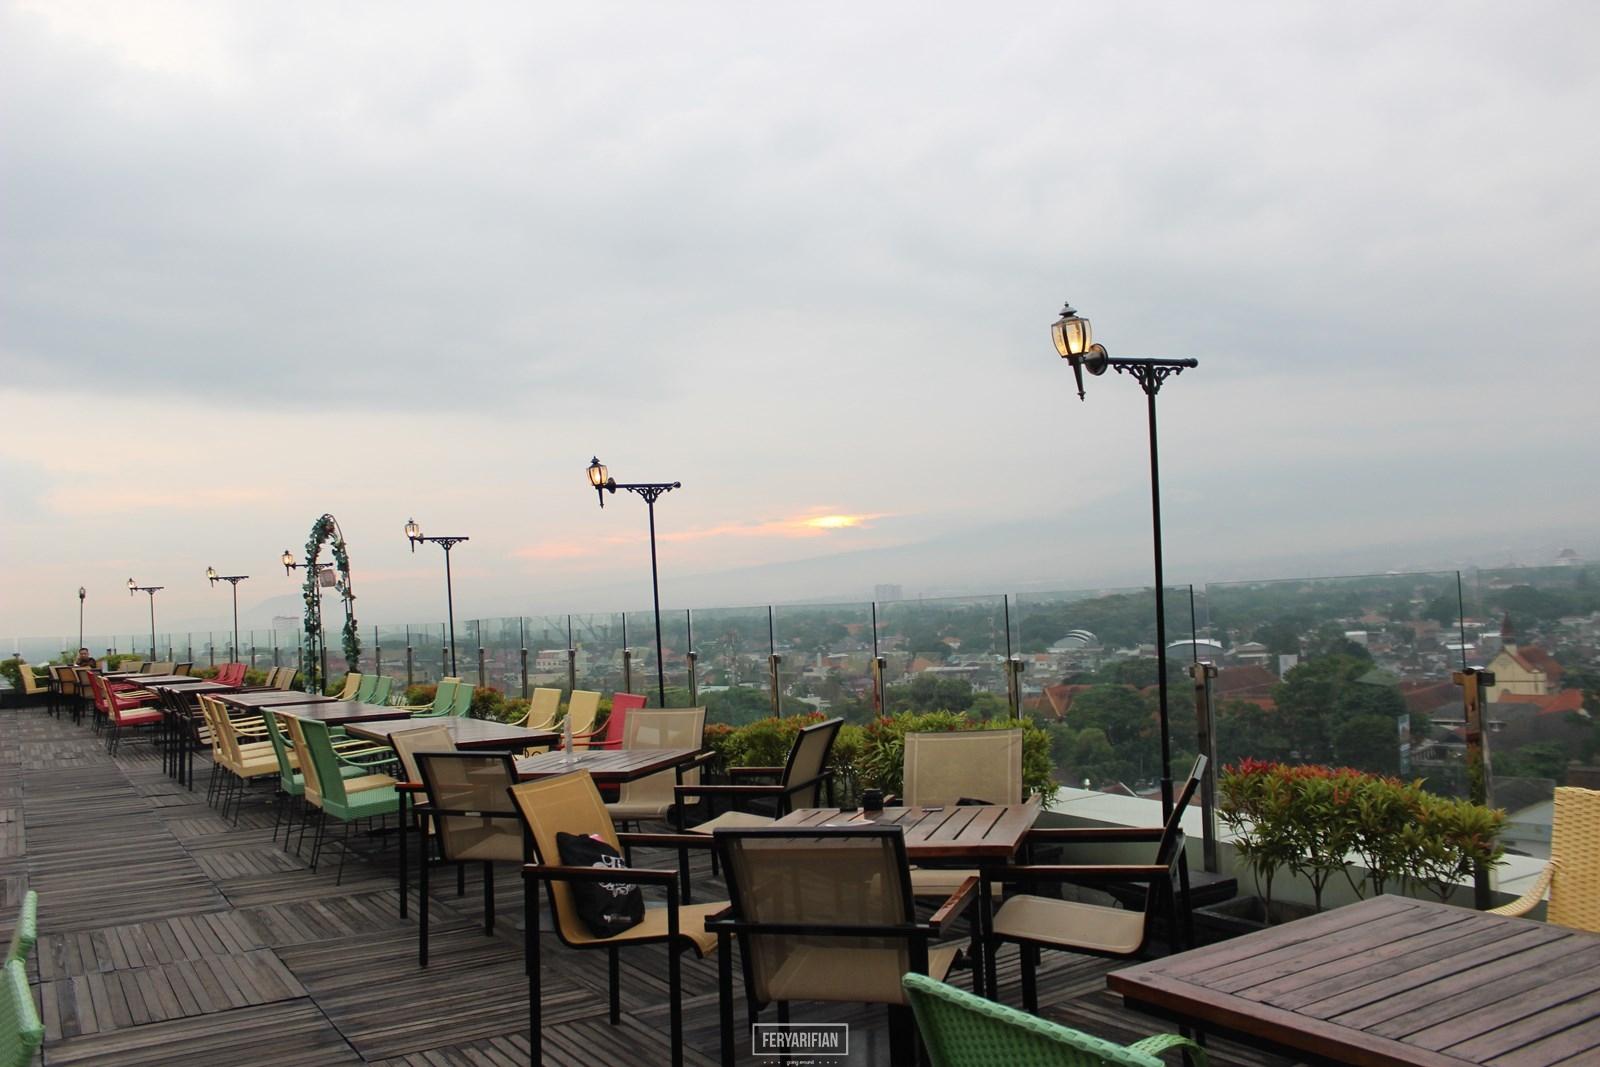 Sky Room The 101 Oj Hotel Menikmati Sunset Dari Lantai 12 Fery Arifian